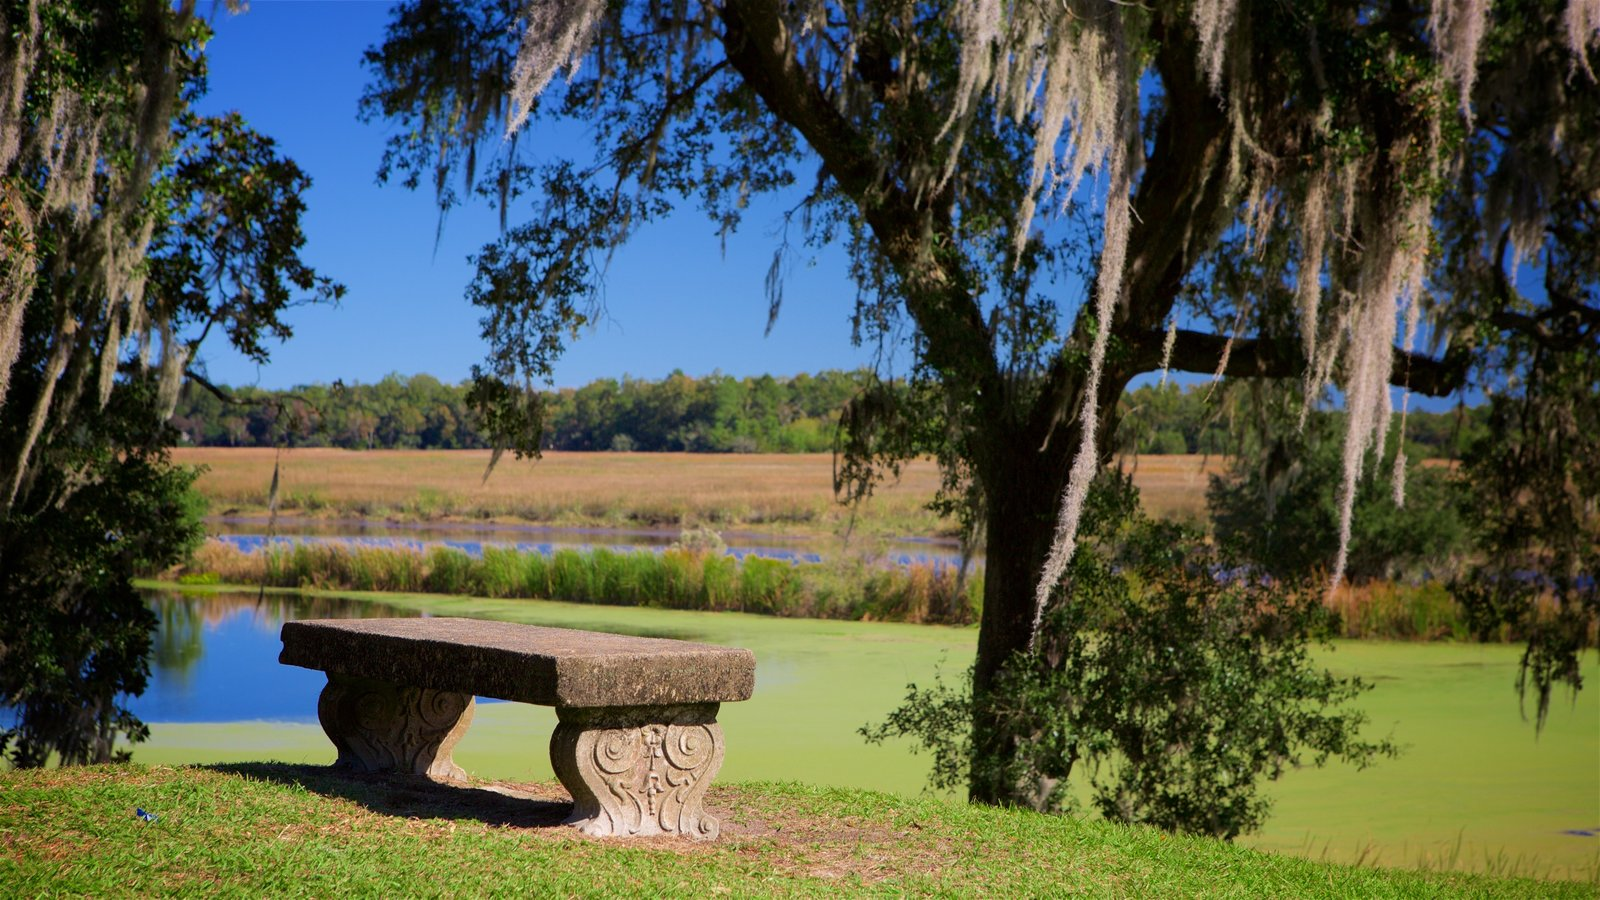 Middleton Place caracterizando um jardim e cenas tranquilas